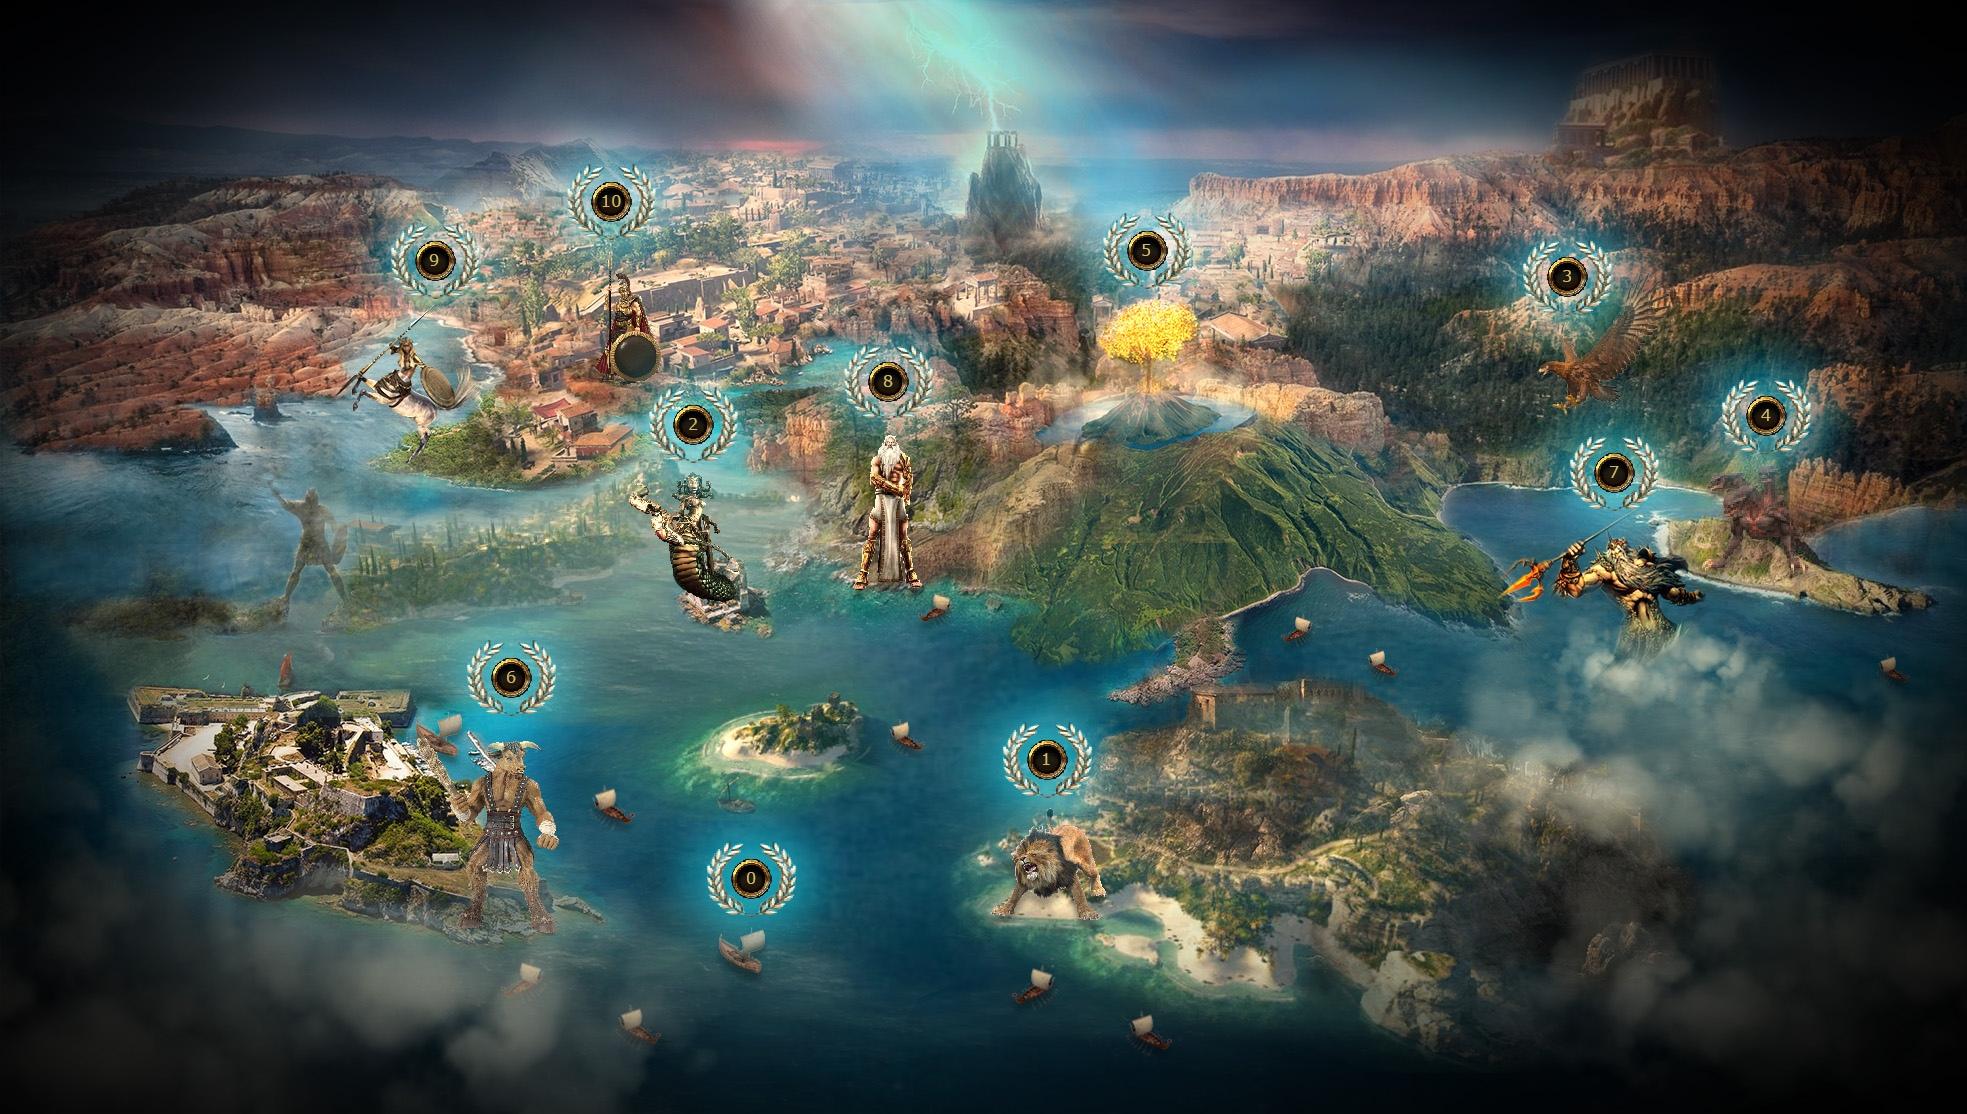 Хакинг по-древнегречески: итоги online-этапа NeoQUEST-2019